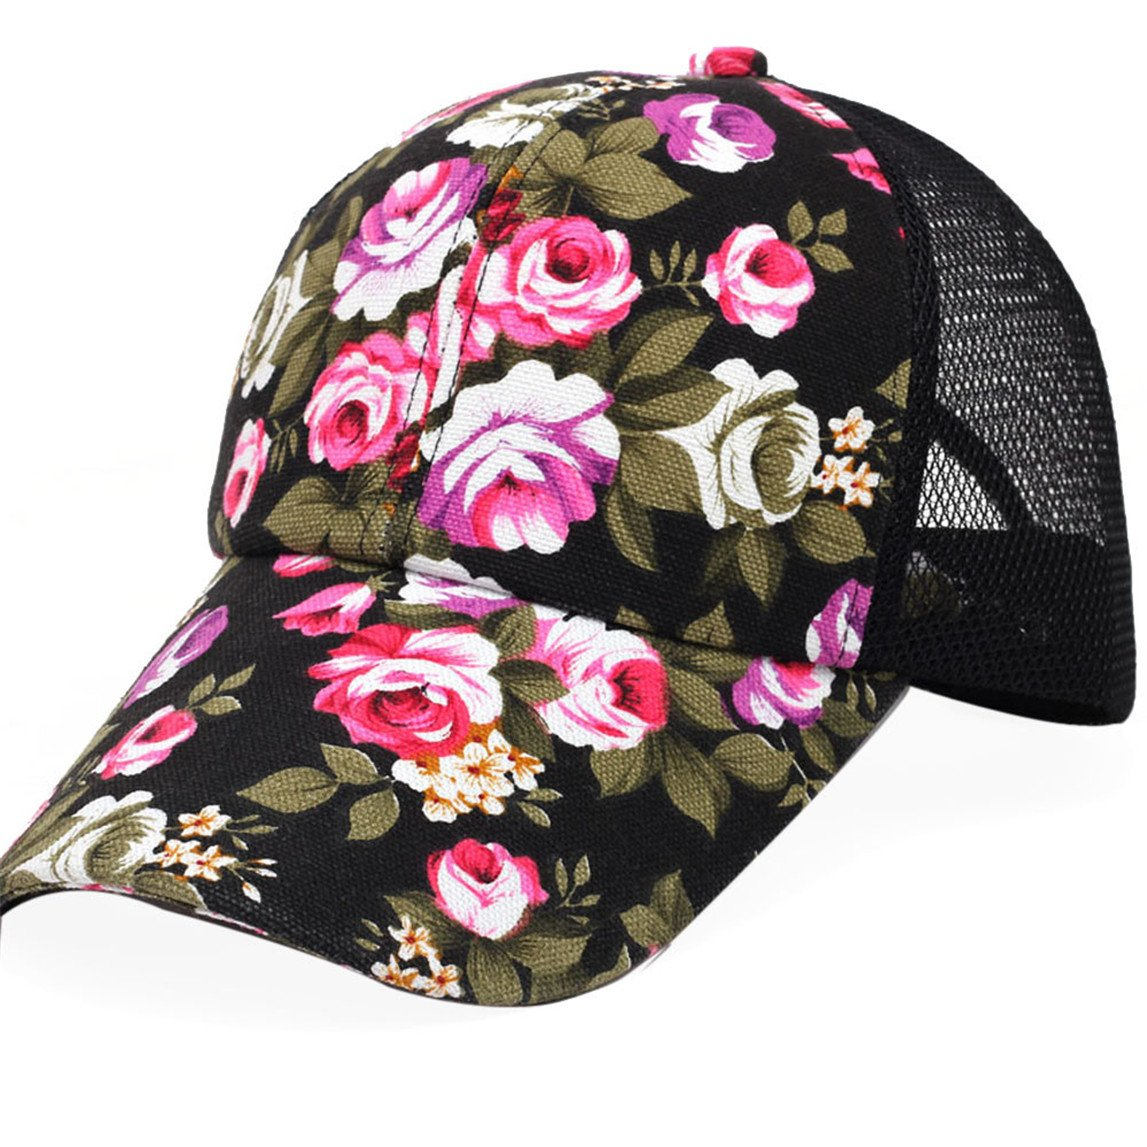 Baseball Cap Clearance,Adjustable Floral Trucker Snapback Cap Baseball Cap Hat for Women Girls (Black)